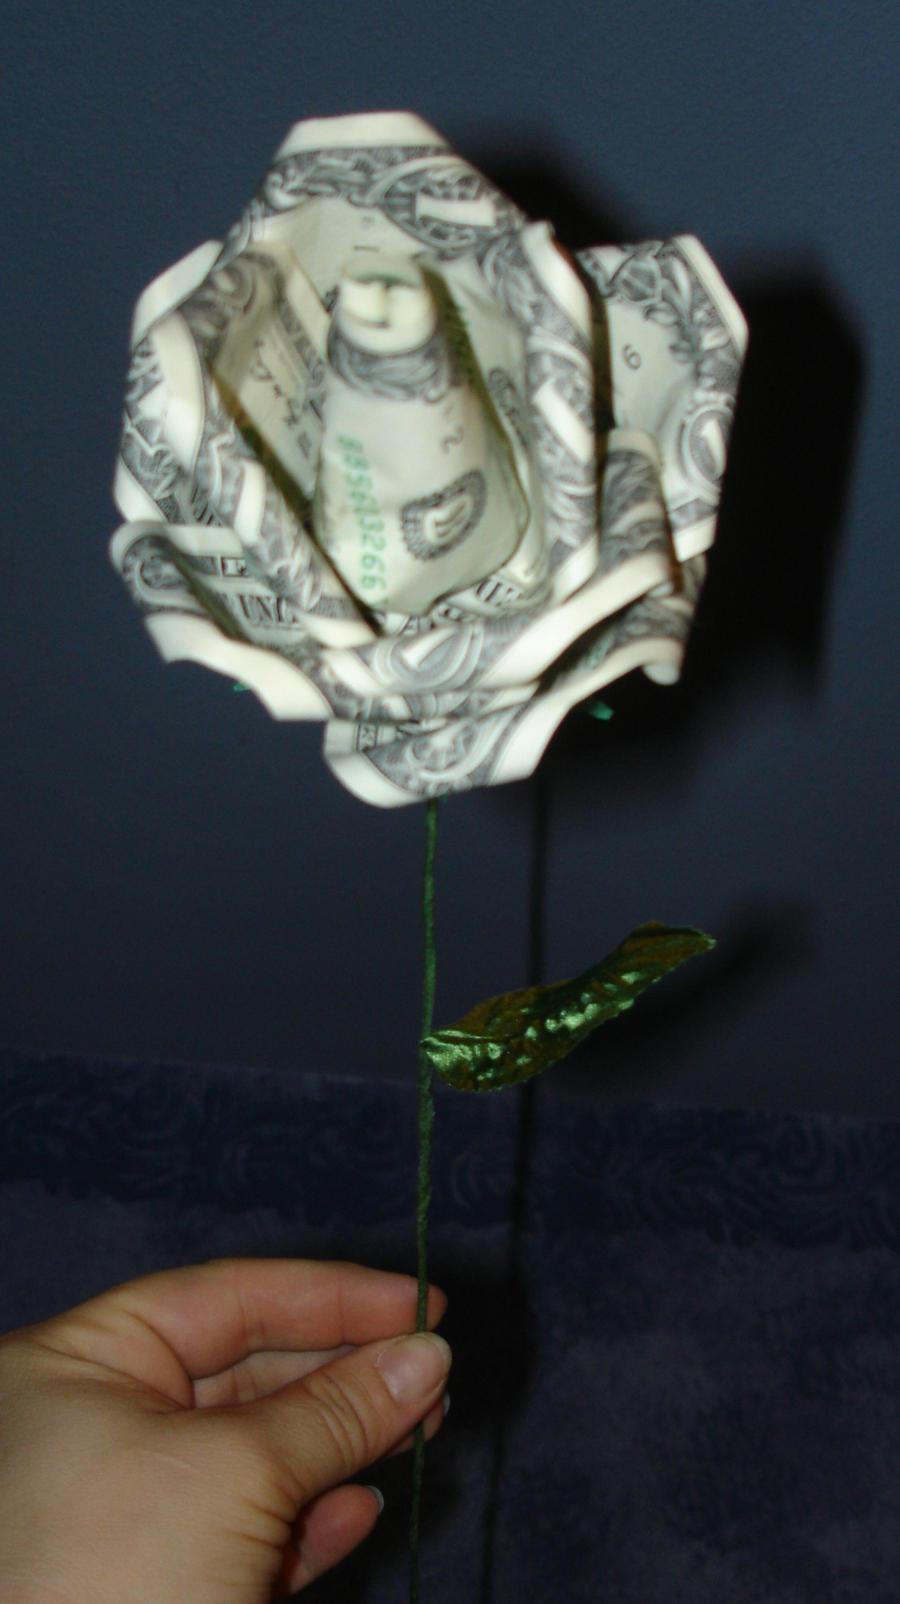 origami money rose by pandaraoke on DeviantArt - photo#17